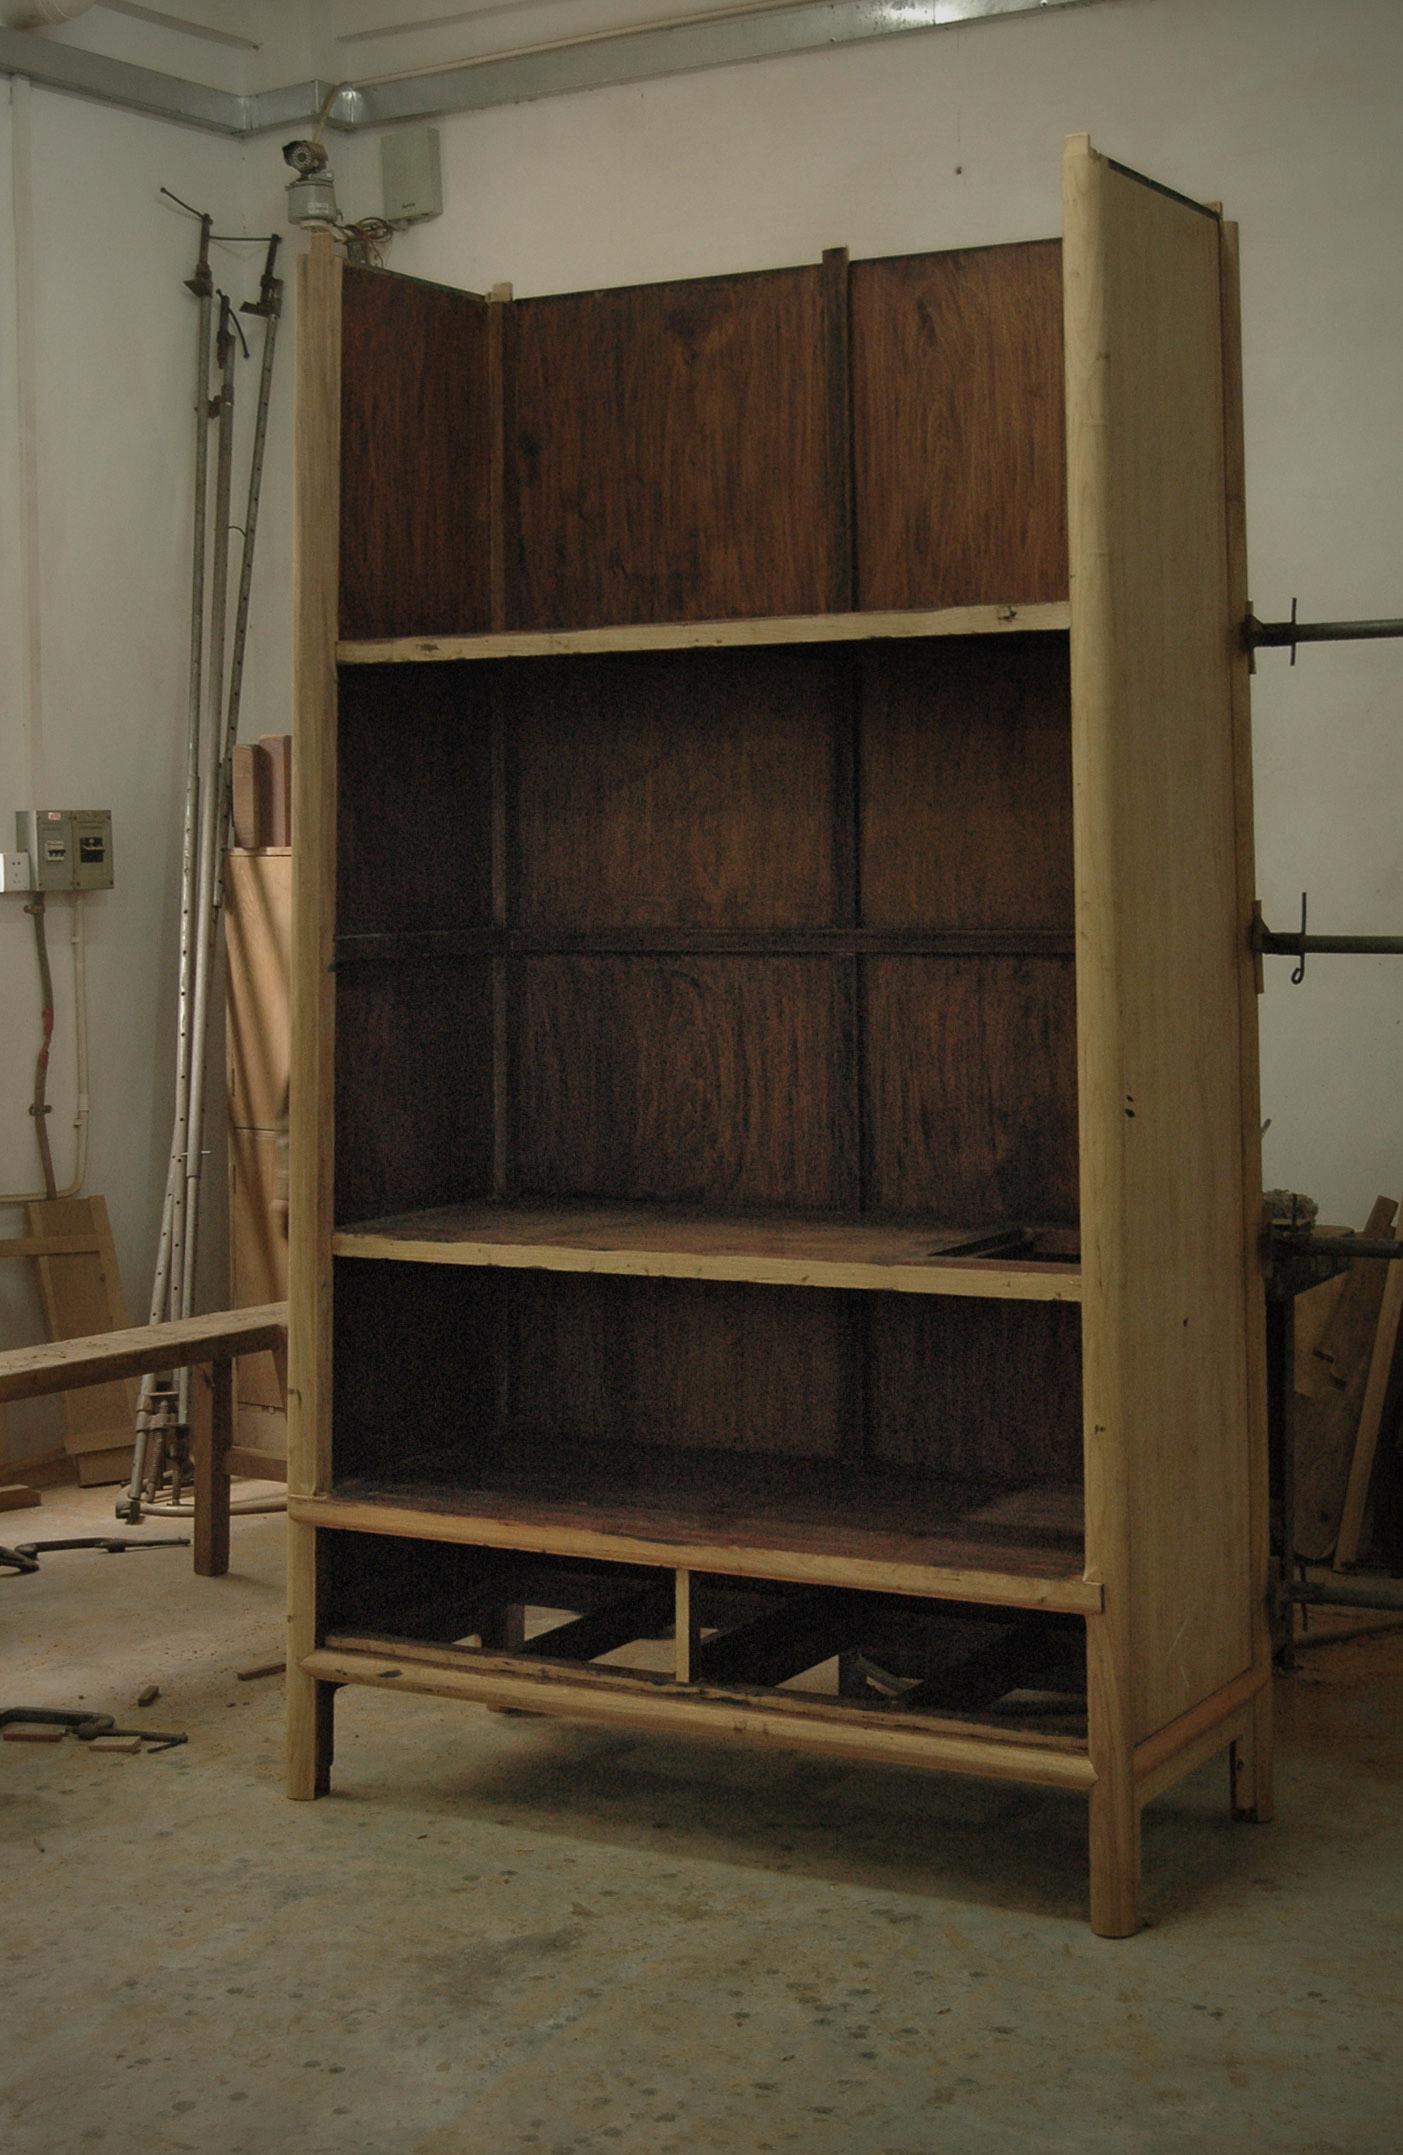 ....bespoke furniture   rosewood london : crafting photos..特别定制家具   瑰丽伦敦酒店:制作照片....